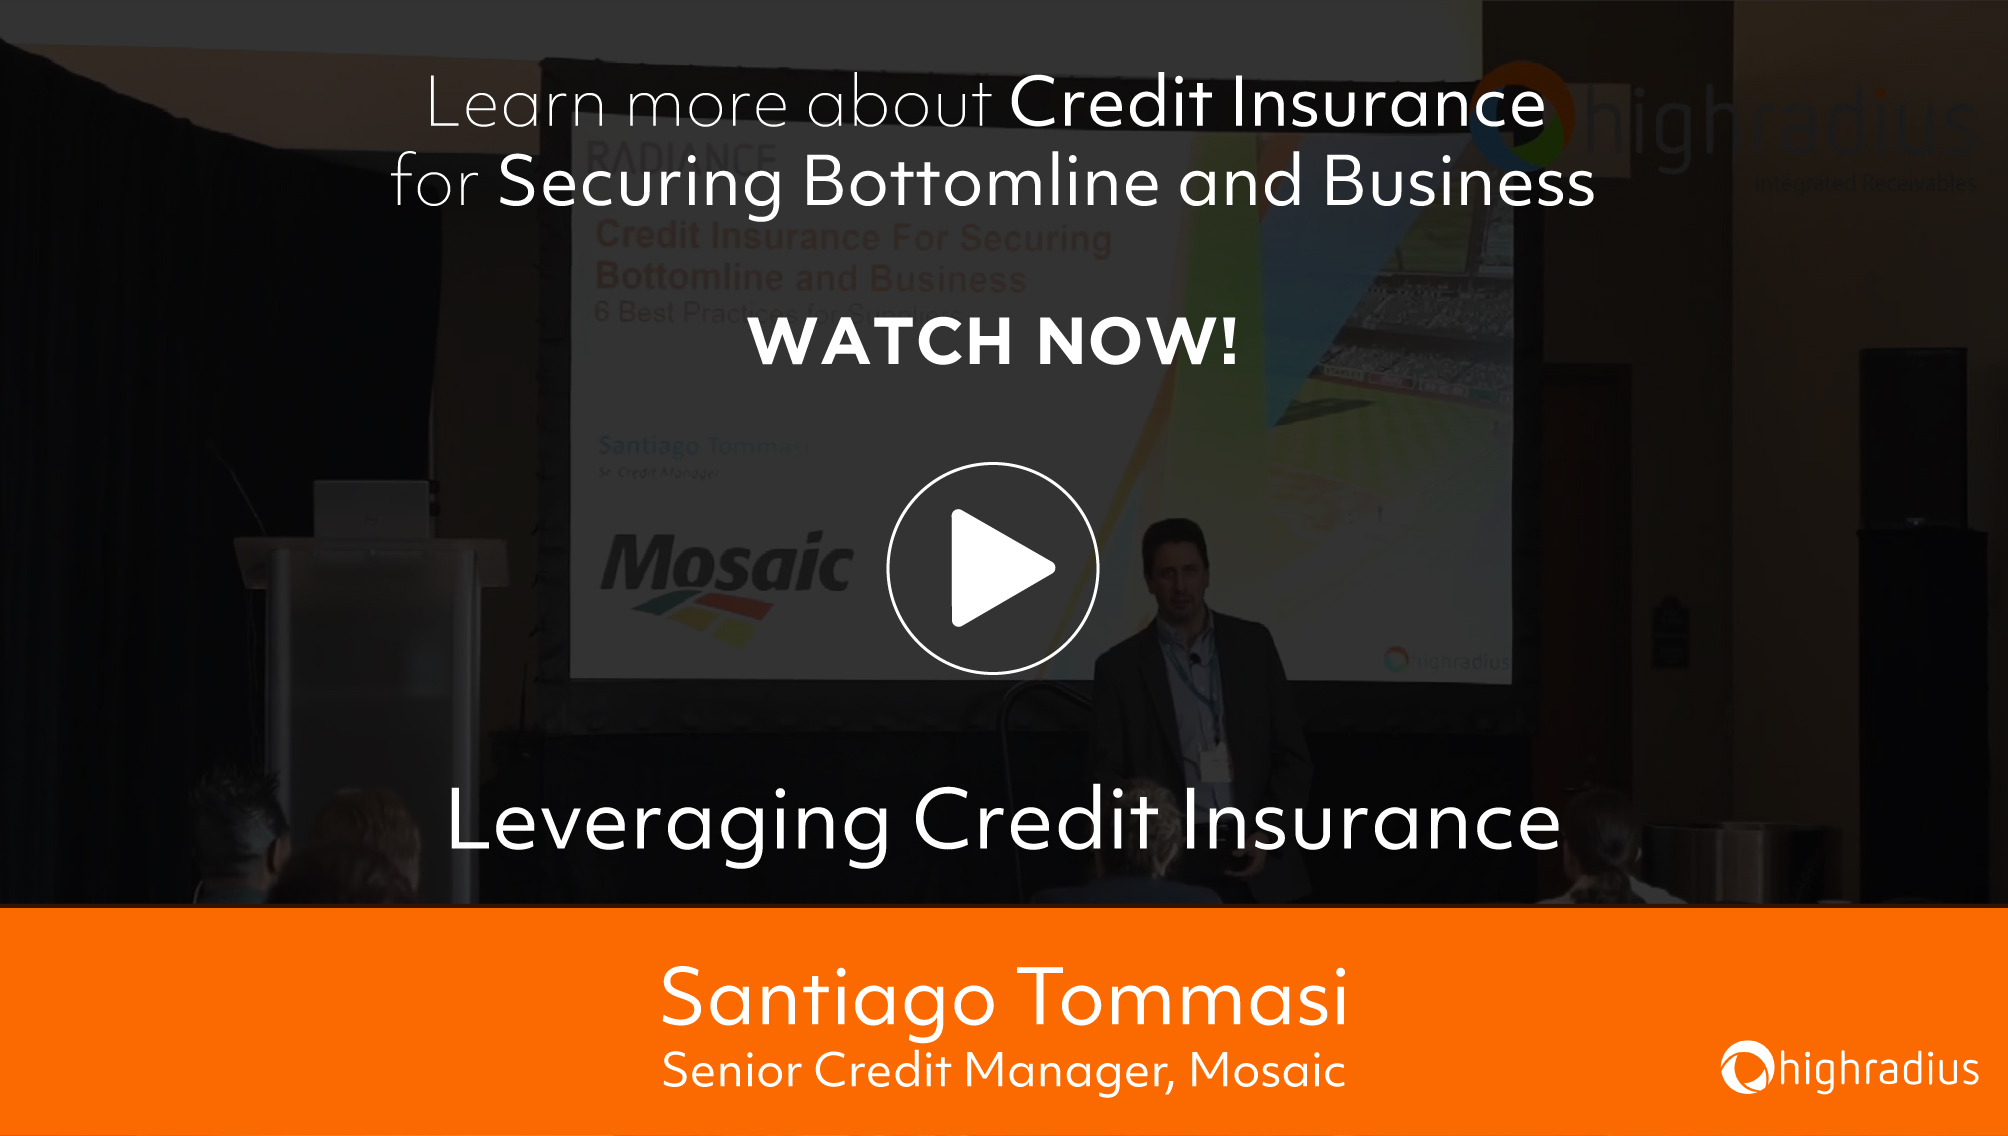 Leveraging Credit Insurance